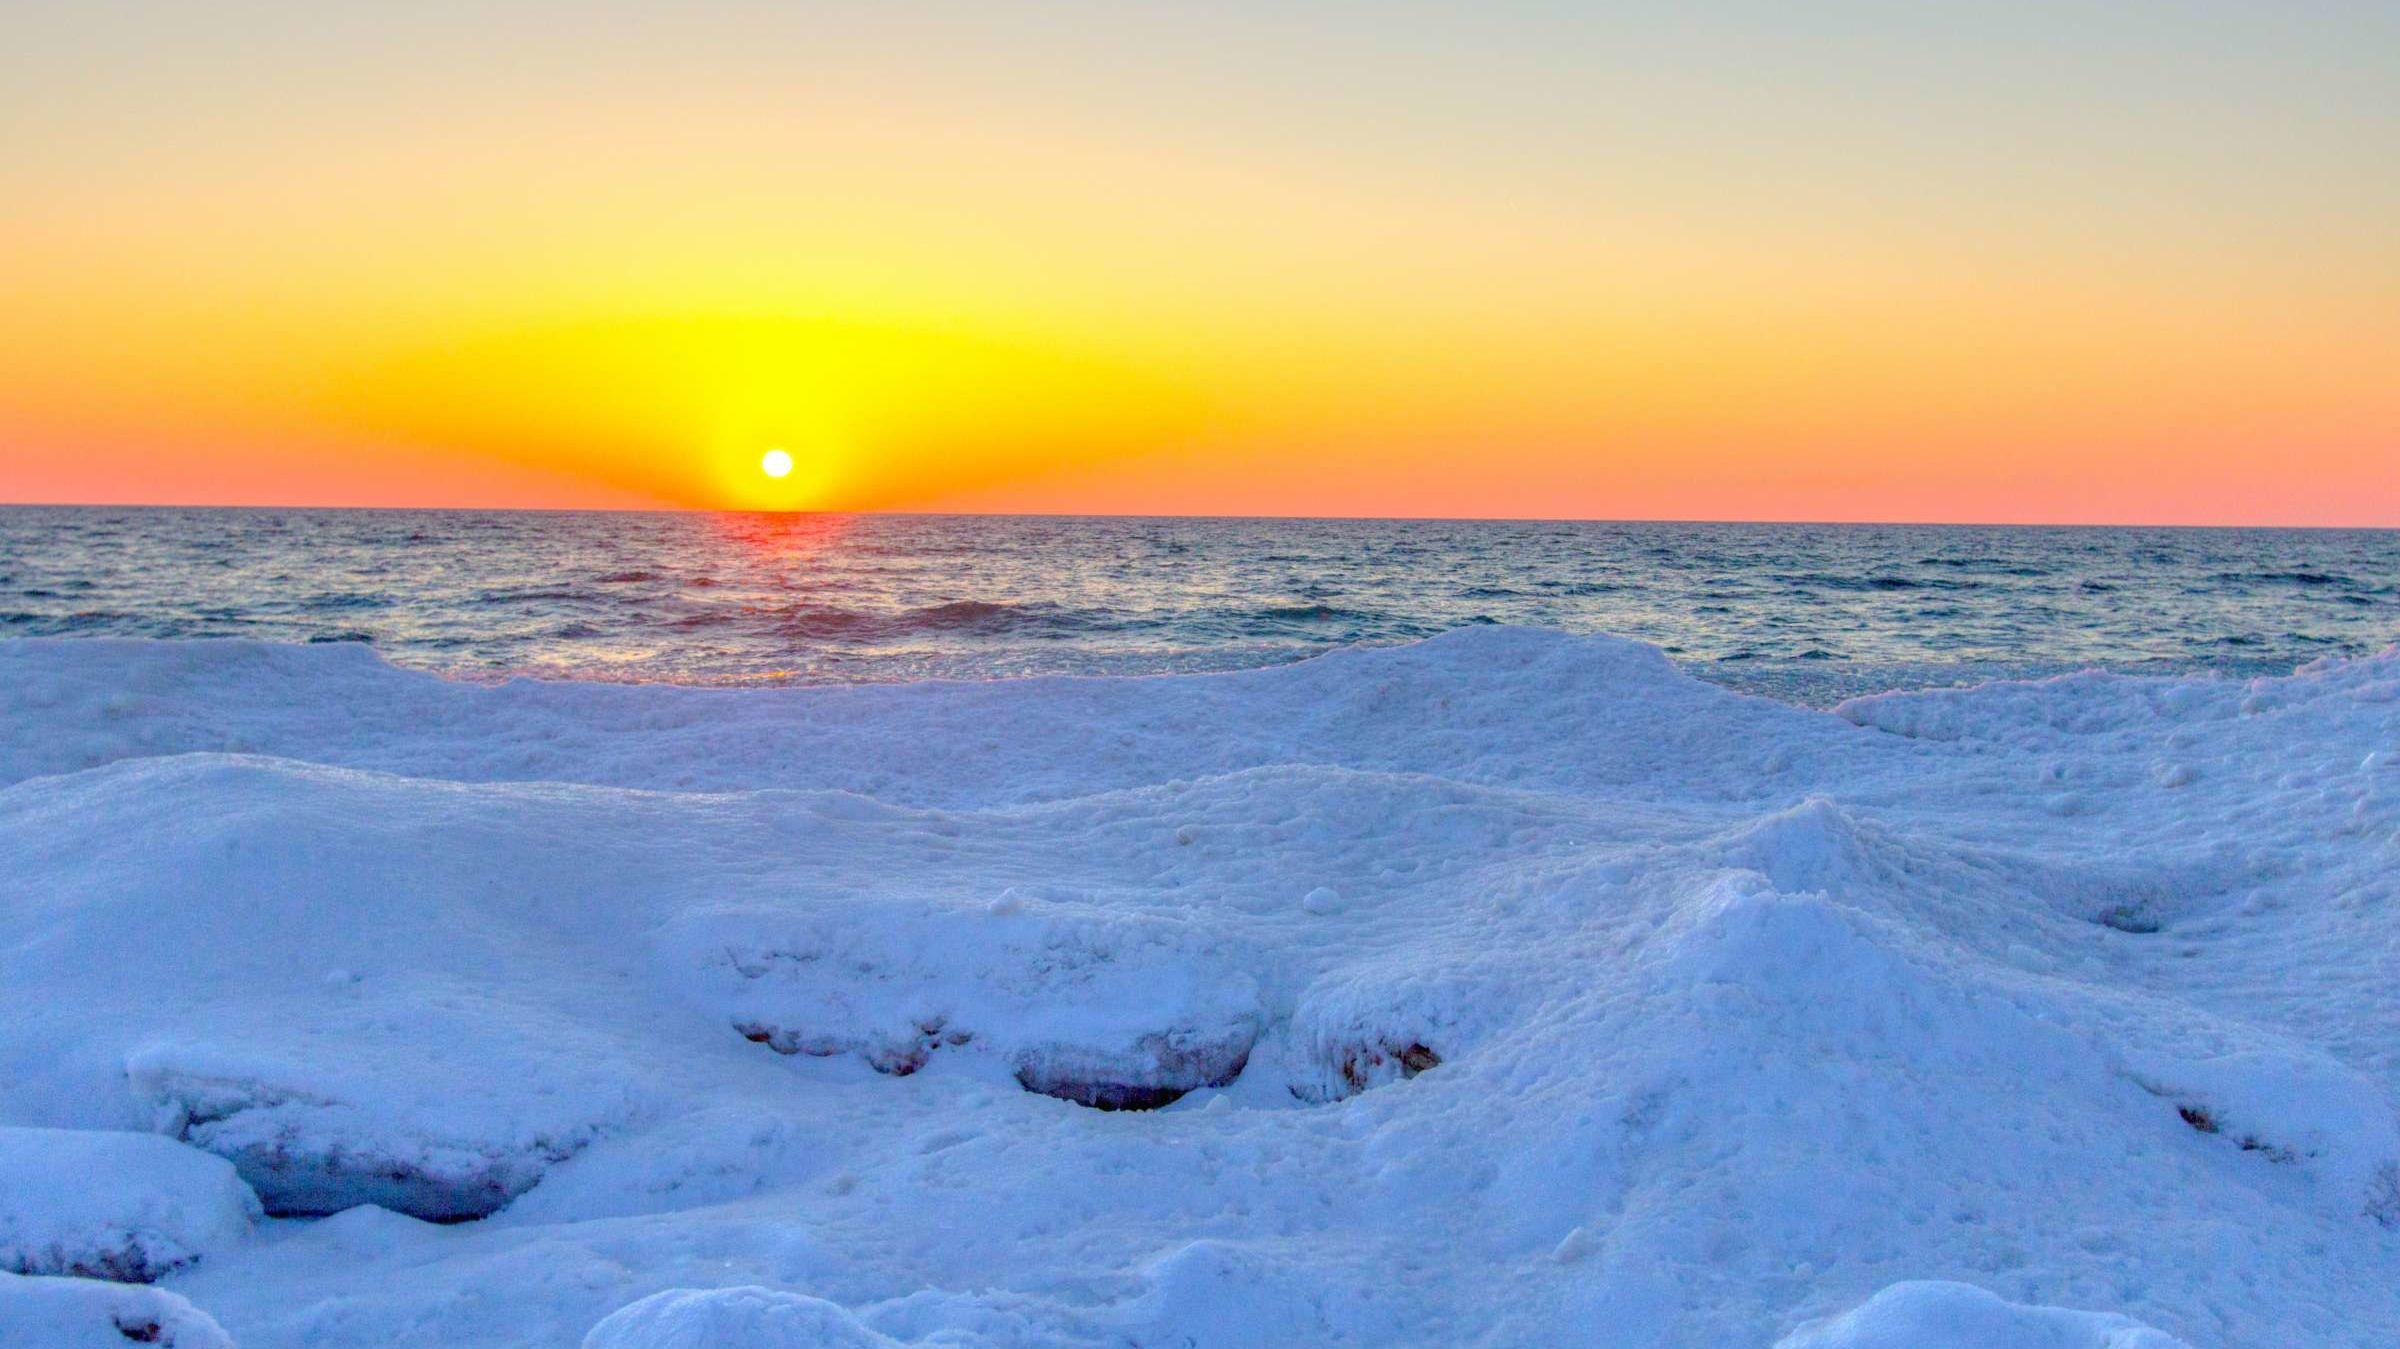 Watch: Rare 'Ice Volcanoes' Are Erupting on a Michigan Beach